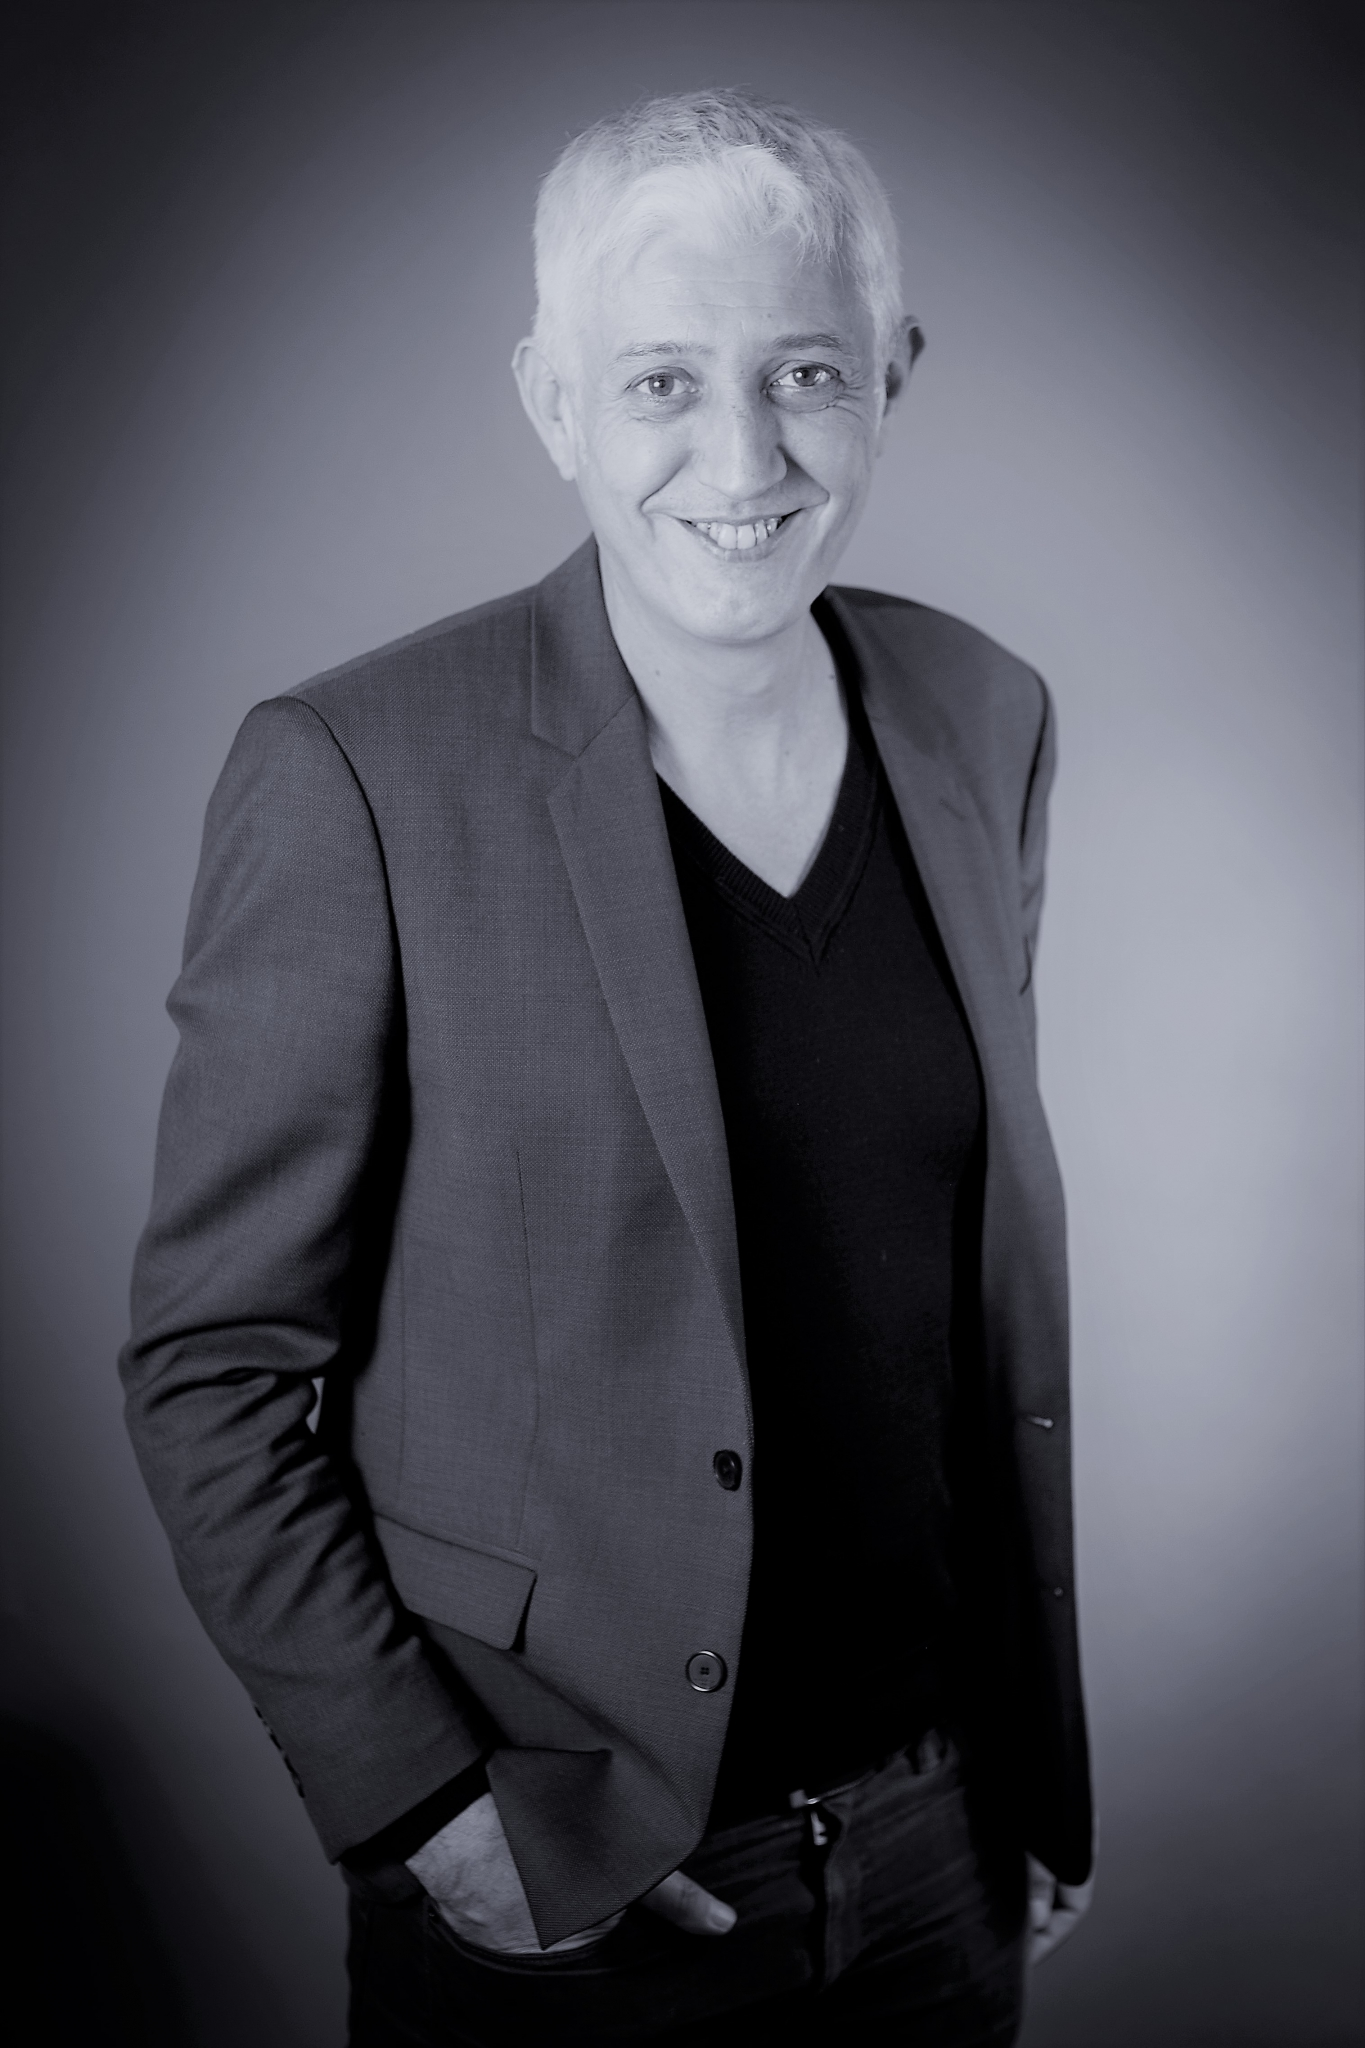 Raphael Voisin - Directeur Artistique - Iconomedia Saison 2